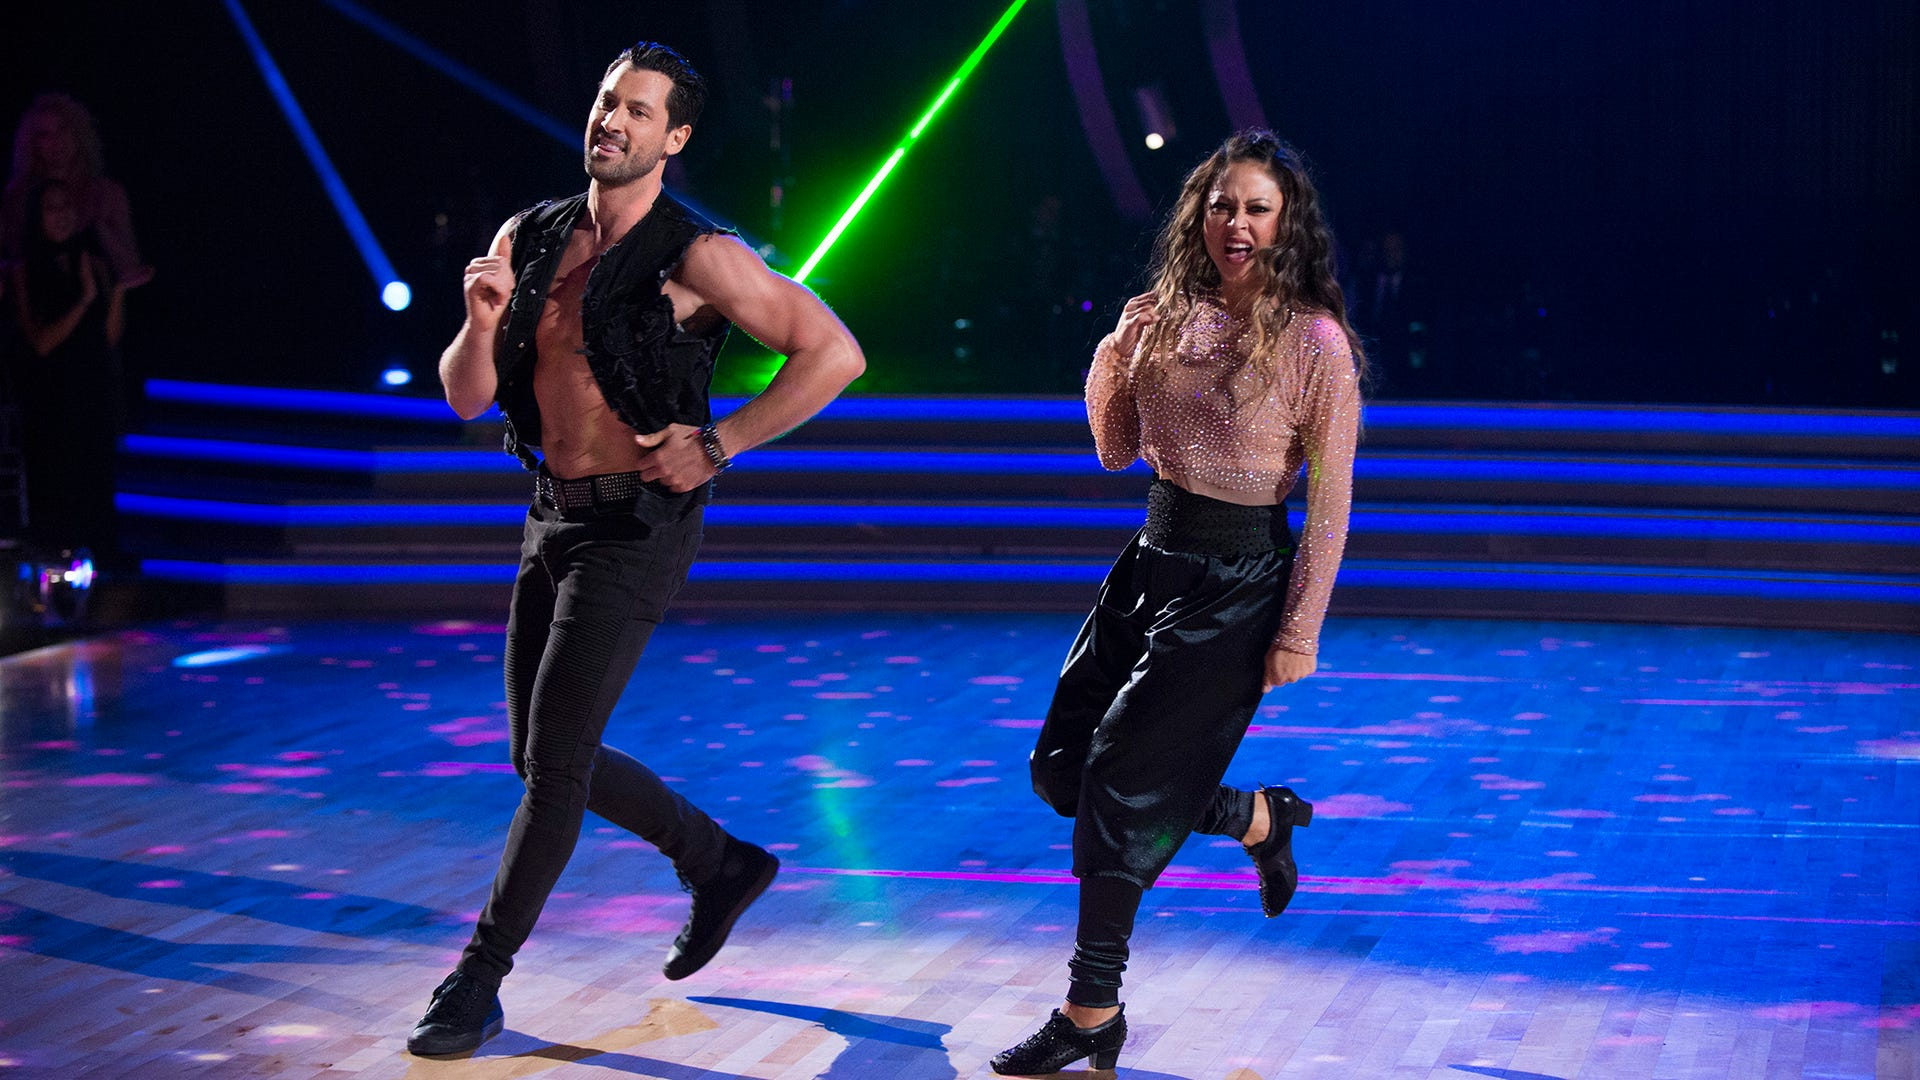 Maksim Chmerkovskiy and Vanessa Lachey, Dancing with the Stars